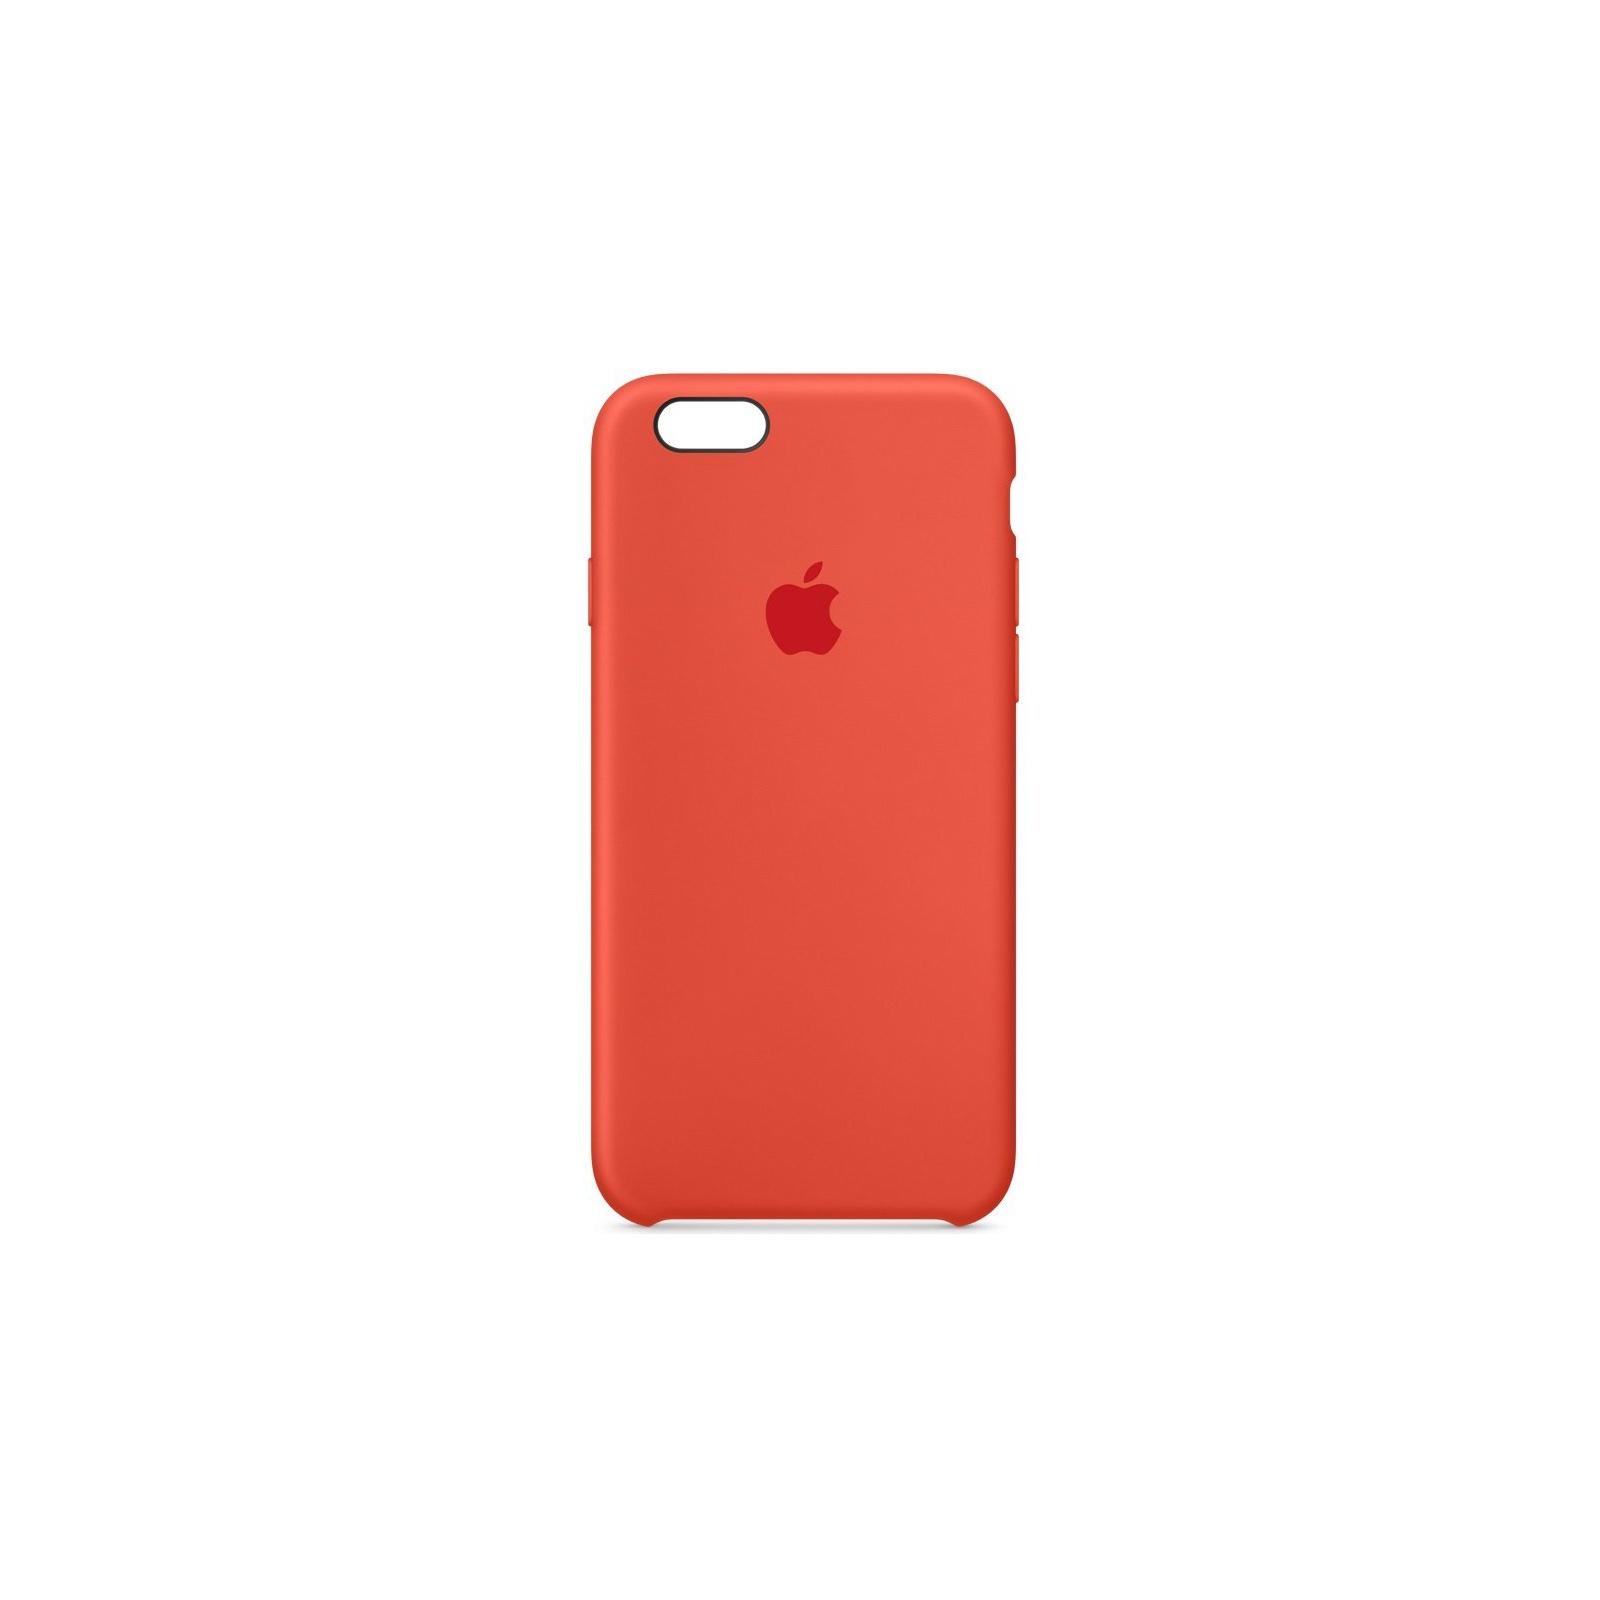 Чехол для моб. телефона Apple для iPhone 6/6s Orange (MKY62ZM/A)